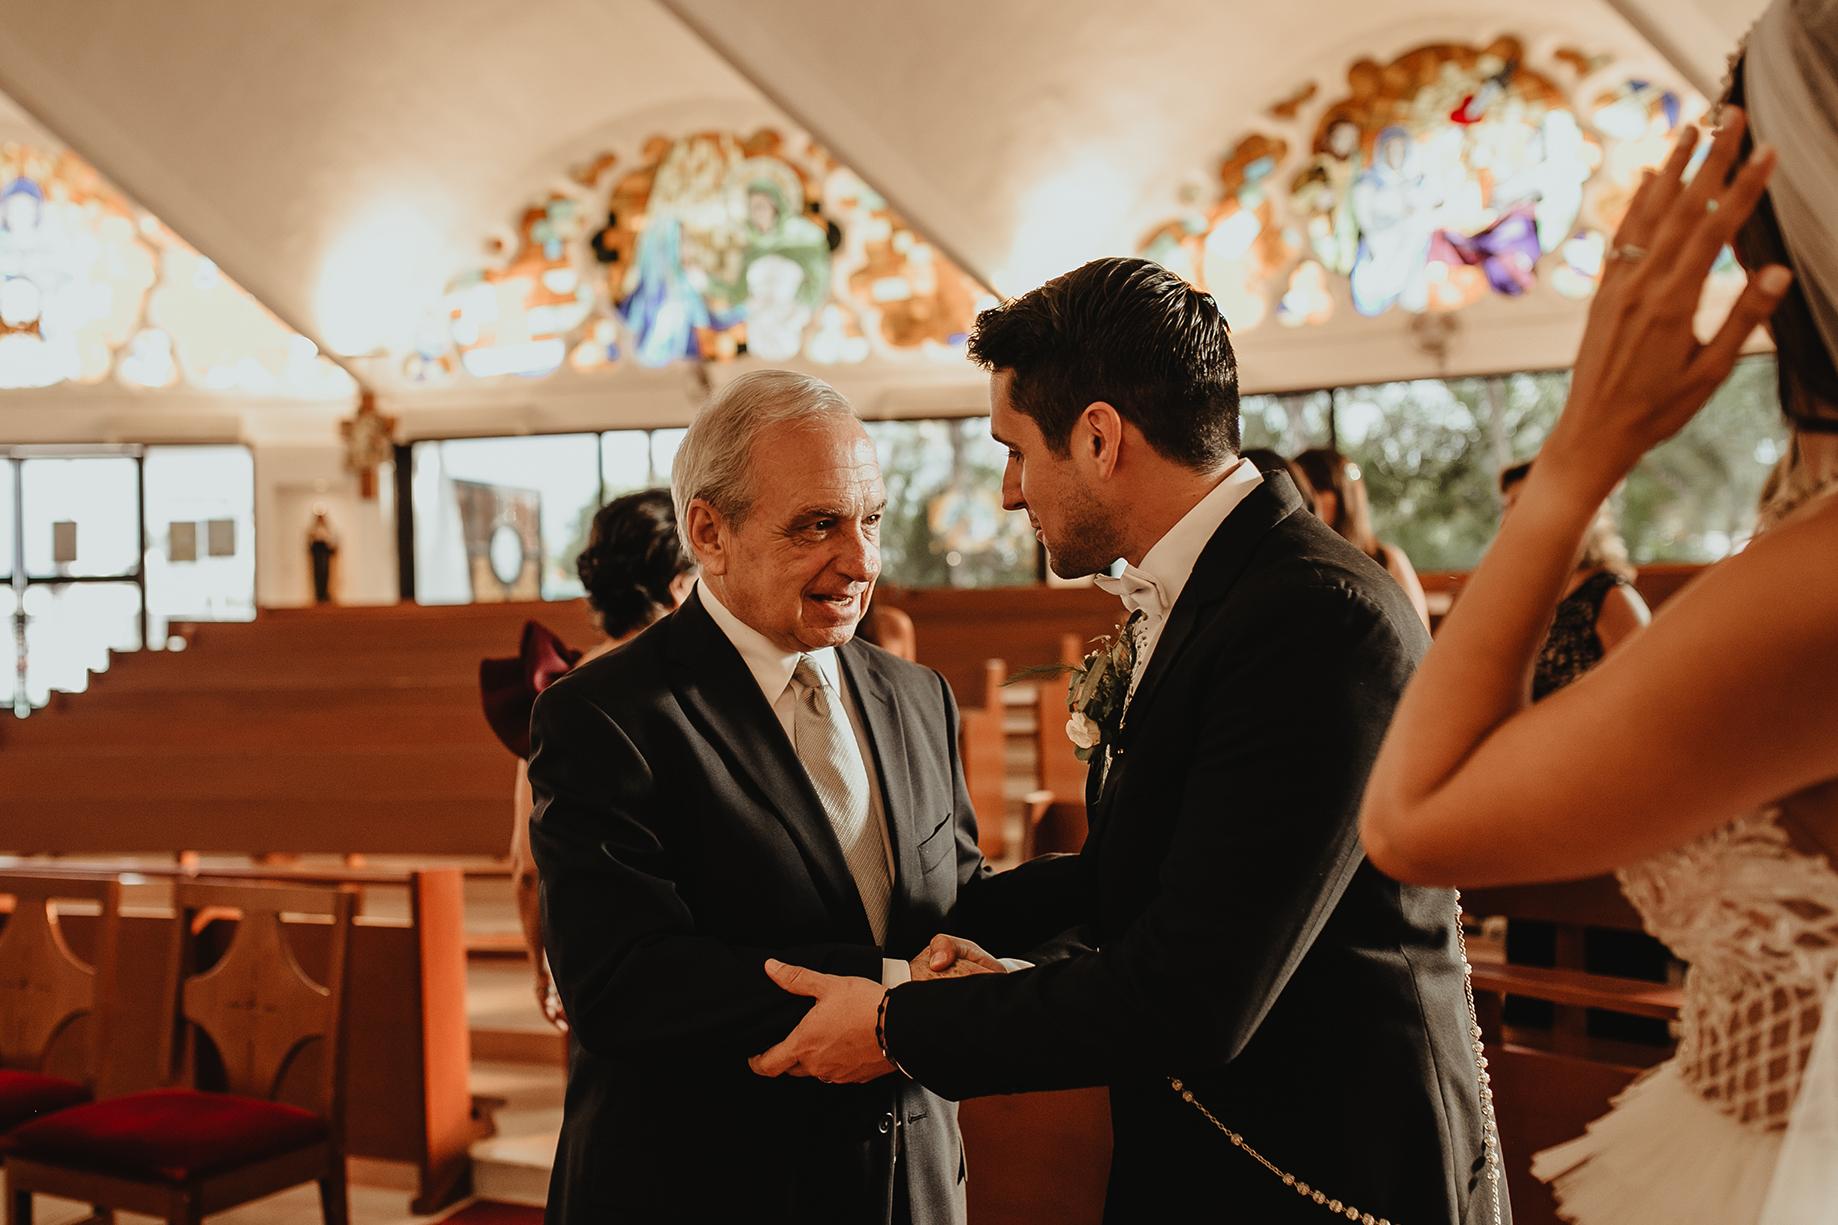 0725R&F__WeddingDestination_Weddingmerida_BodaMexico_FotografoDeBodas_FabrizioSimoneenFotografo.jpg